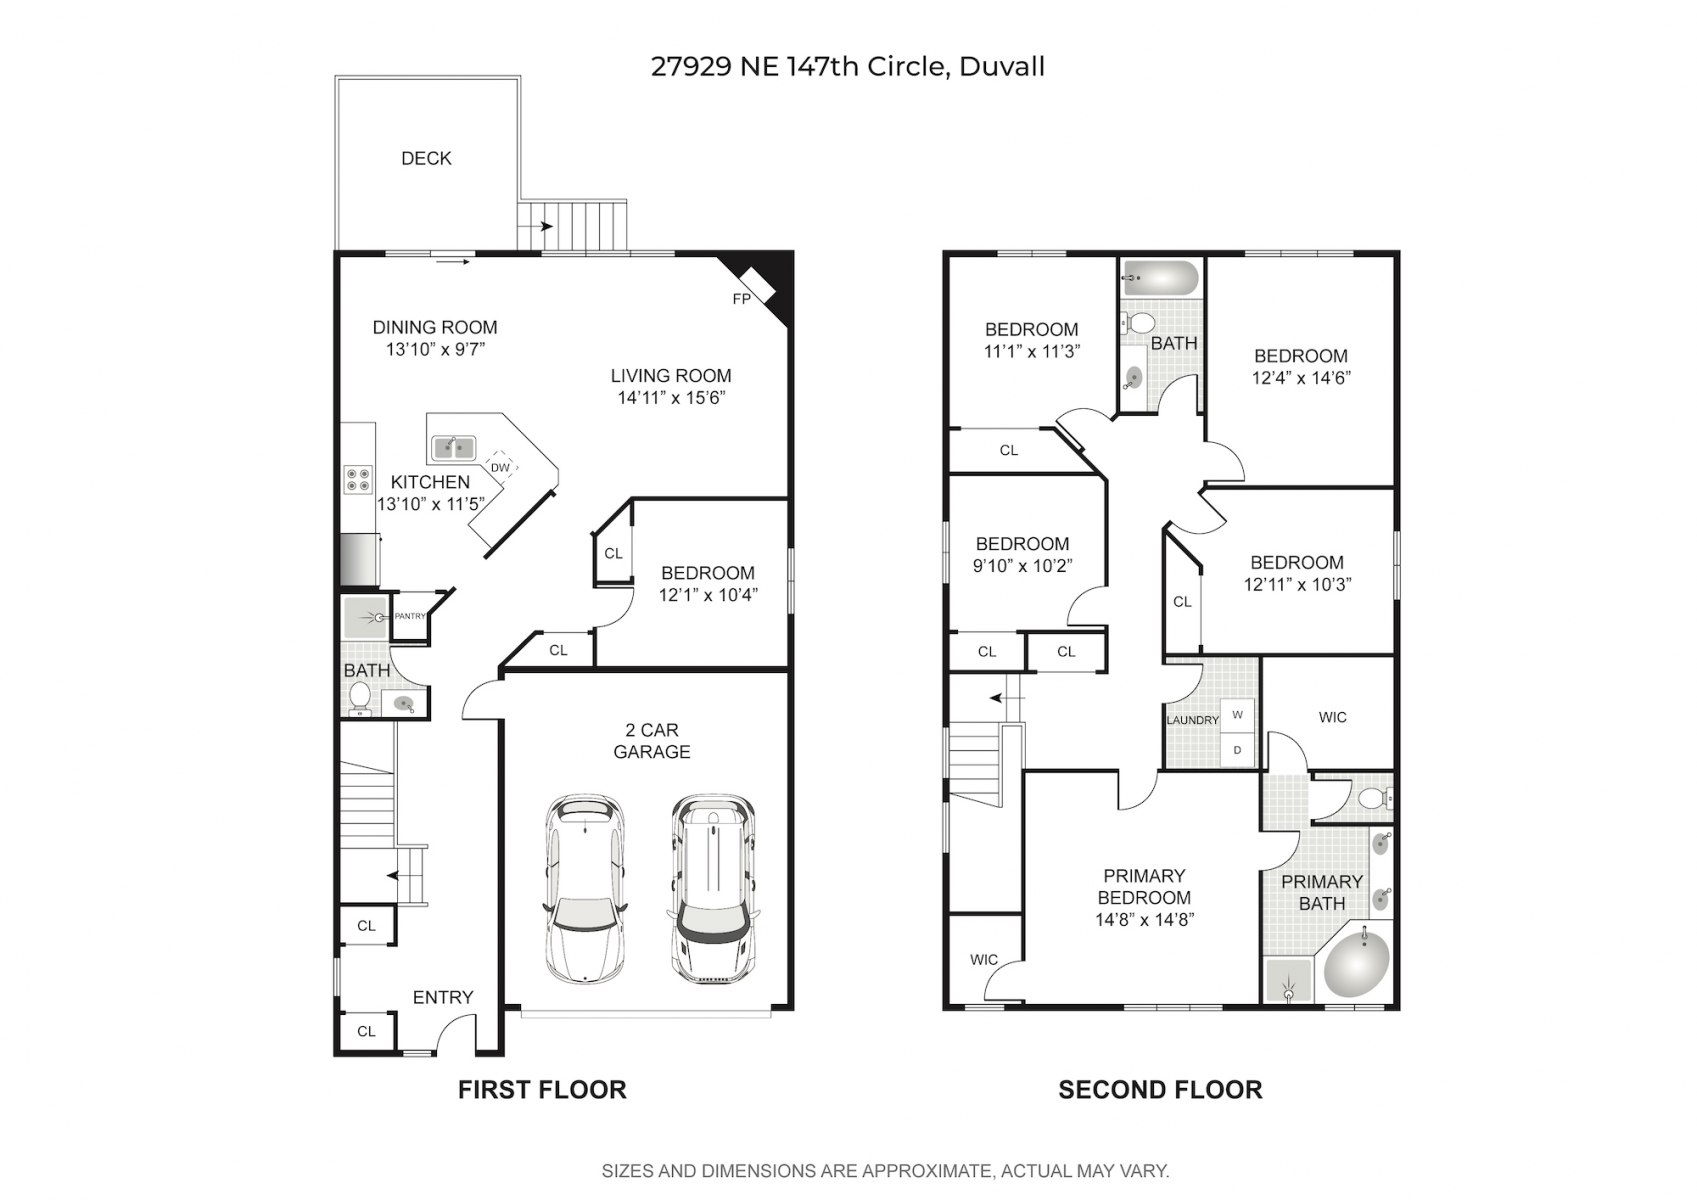 27929-NE-147th-Cir-Duvall-Floorplan